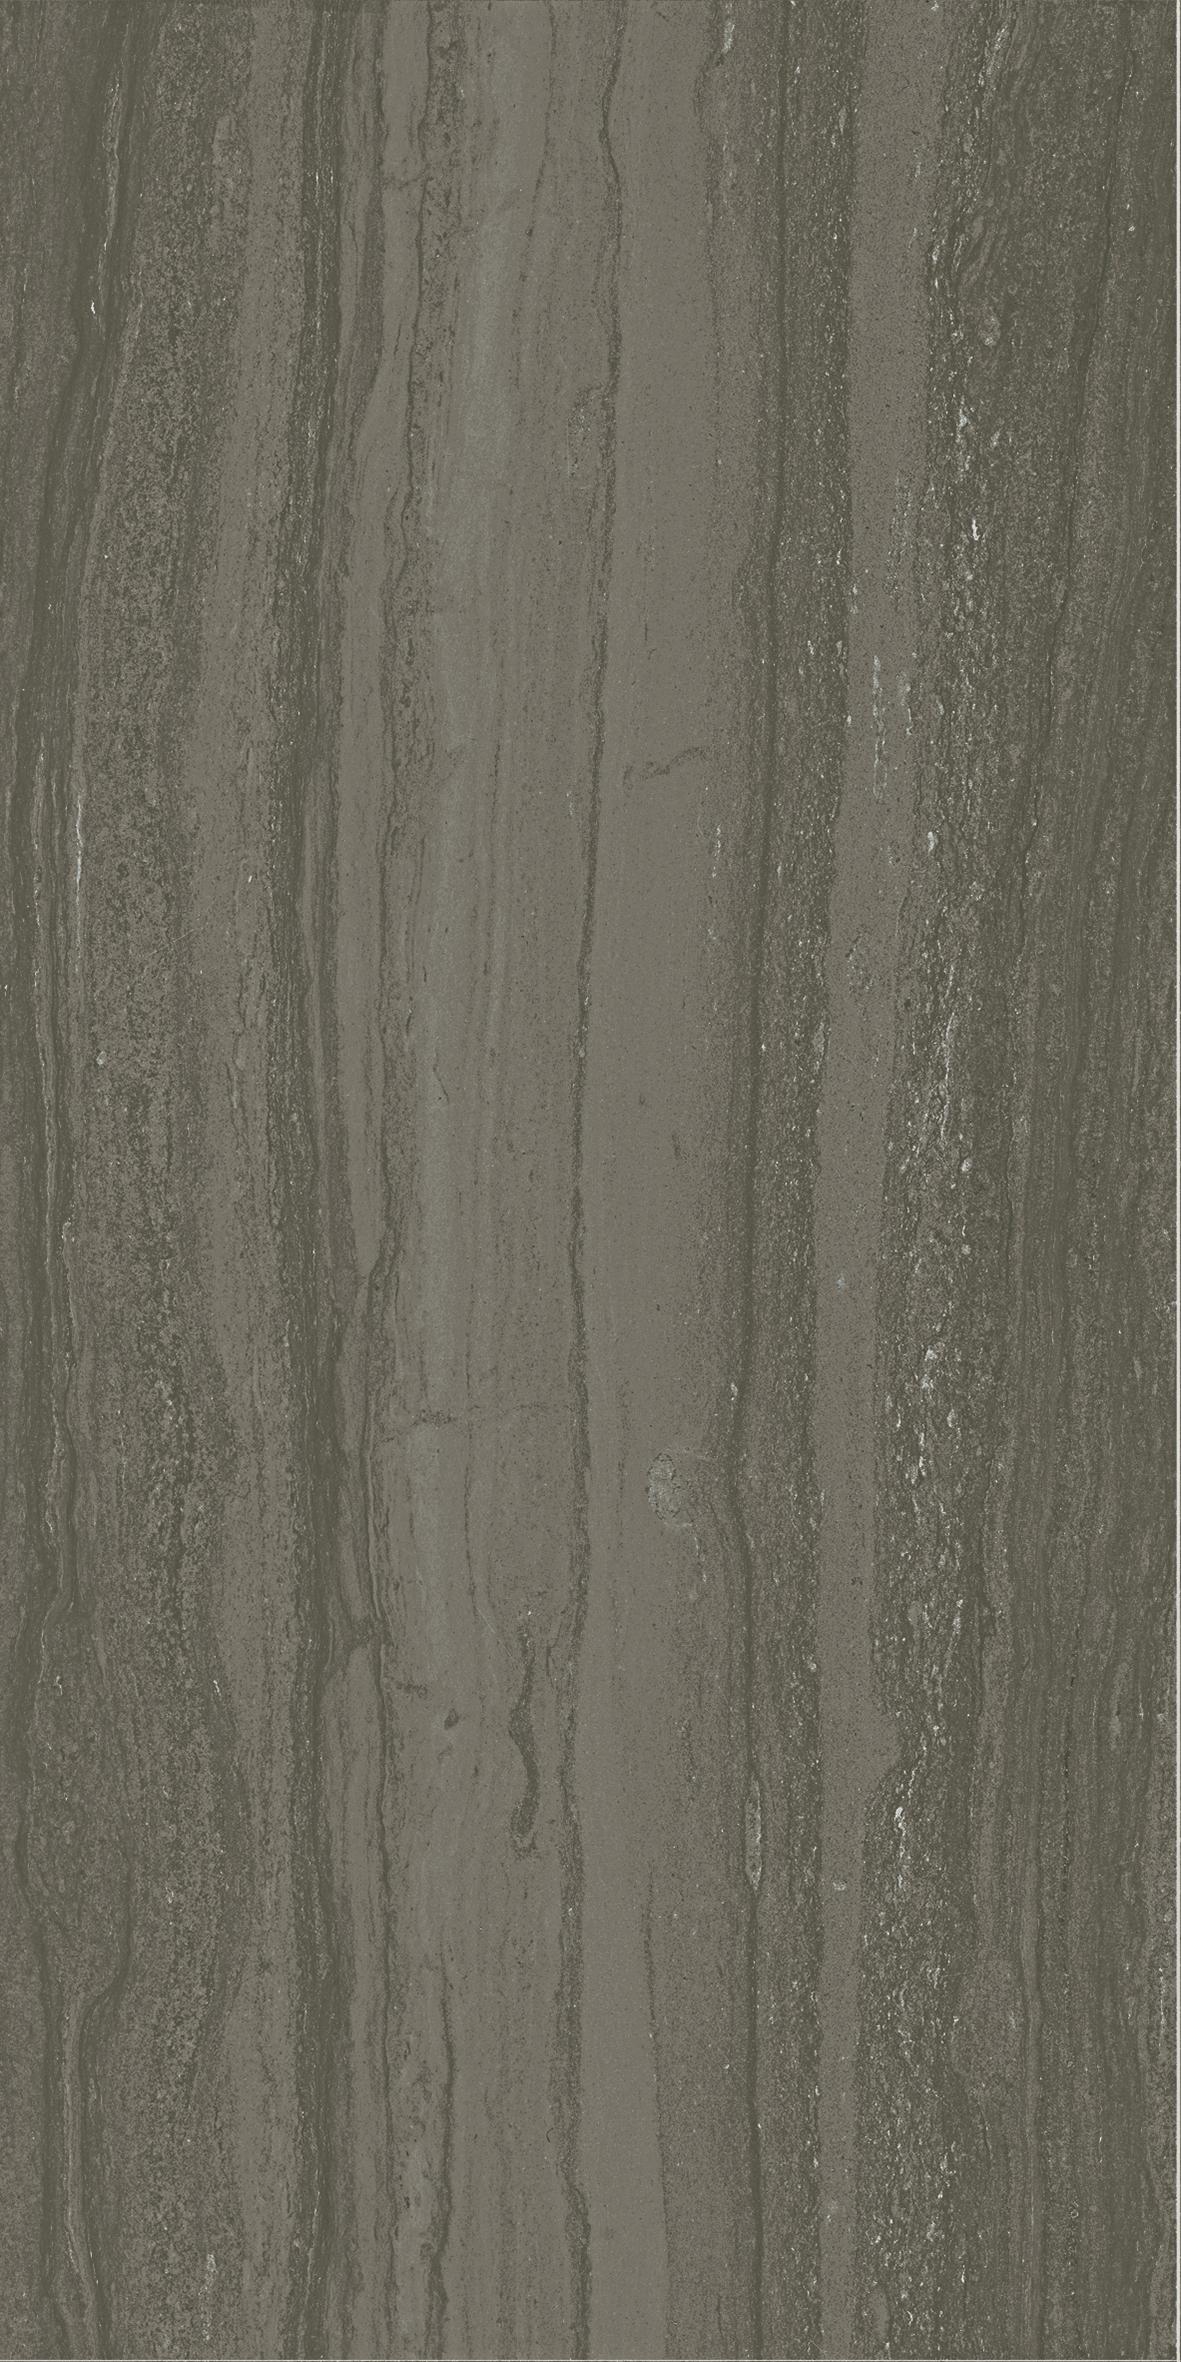 Highland sp hl dark greige 1836 f11 USG1836203